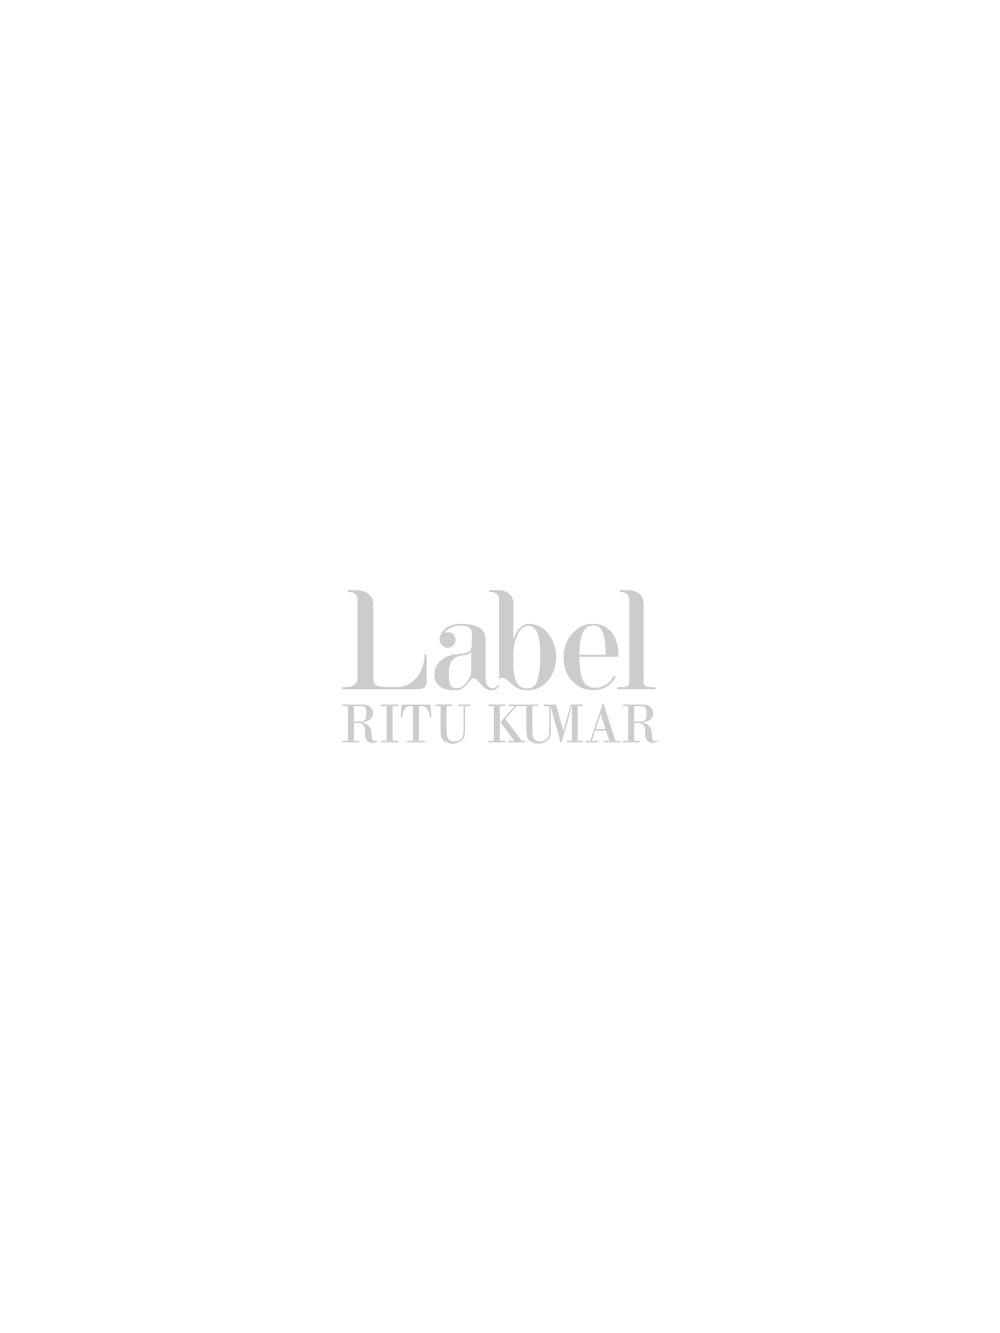 Black & White Monochrome Layered Dress